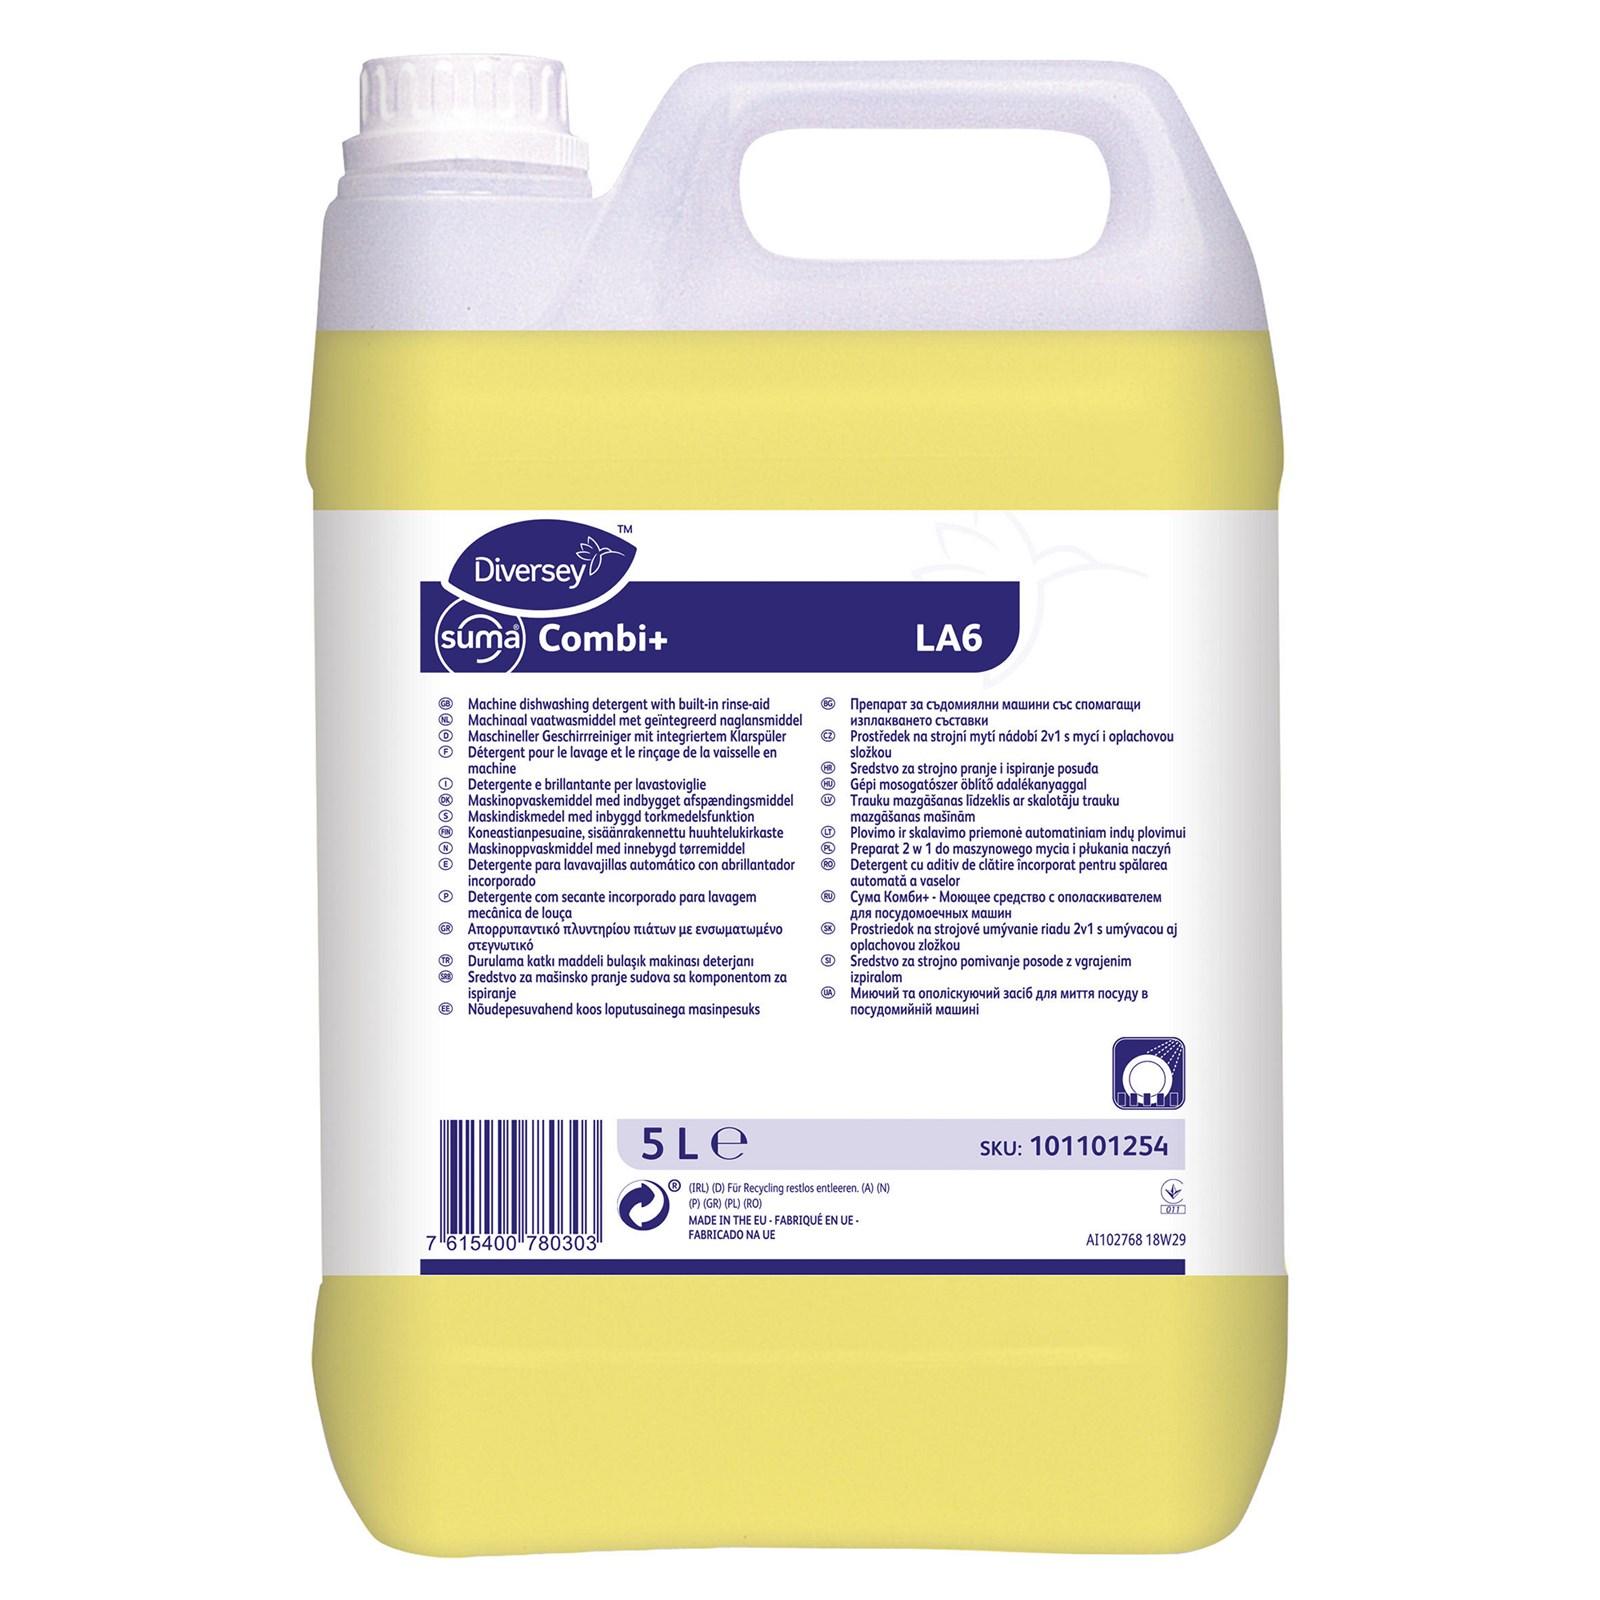 Detergent Si Aditiv Clatire Masina De Spalat Vase Suma Combi La6 Diversey 5l 2021 sanito.ro